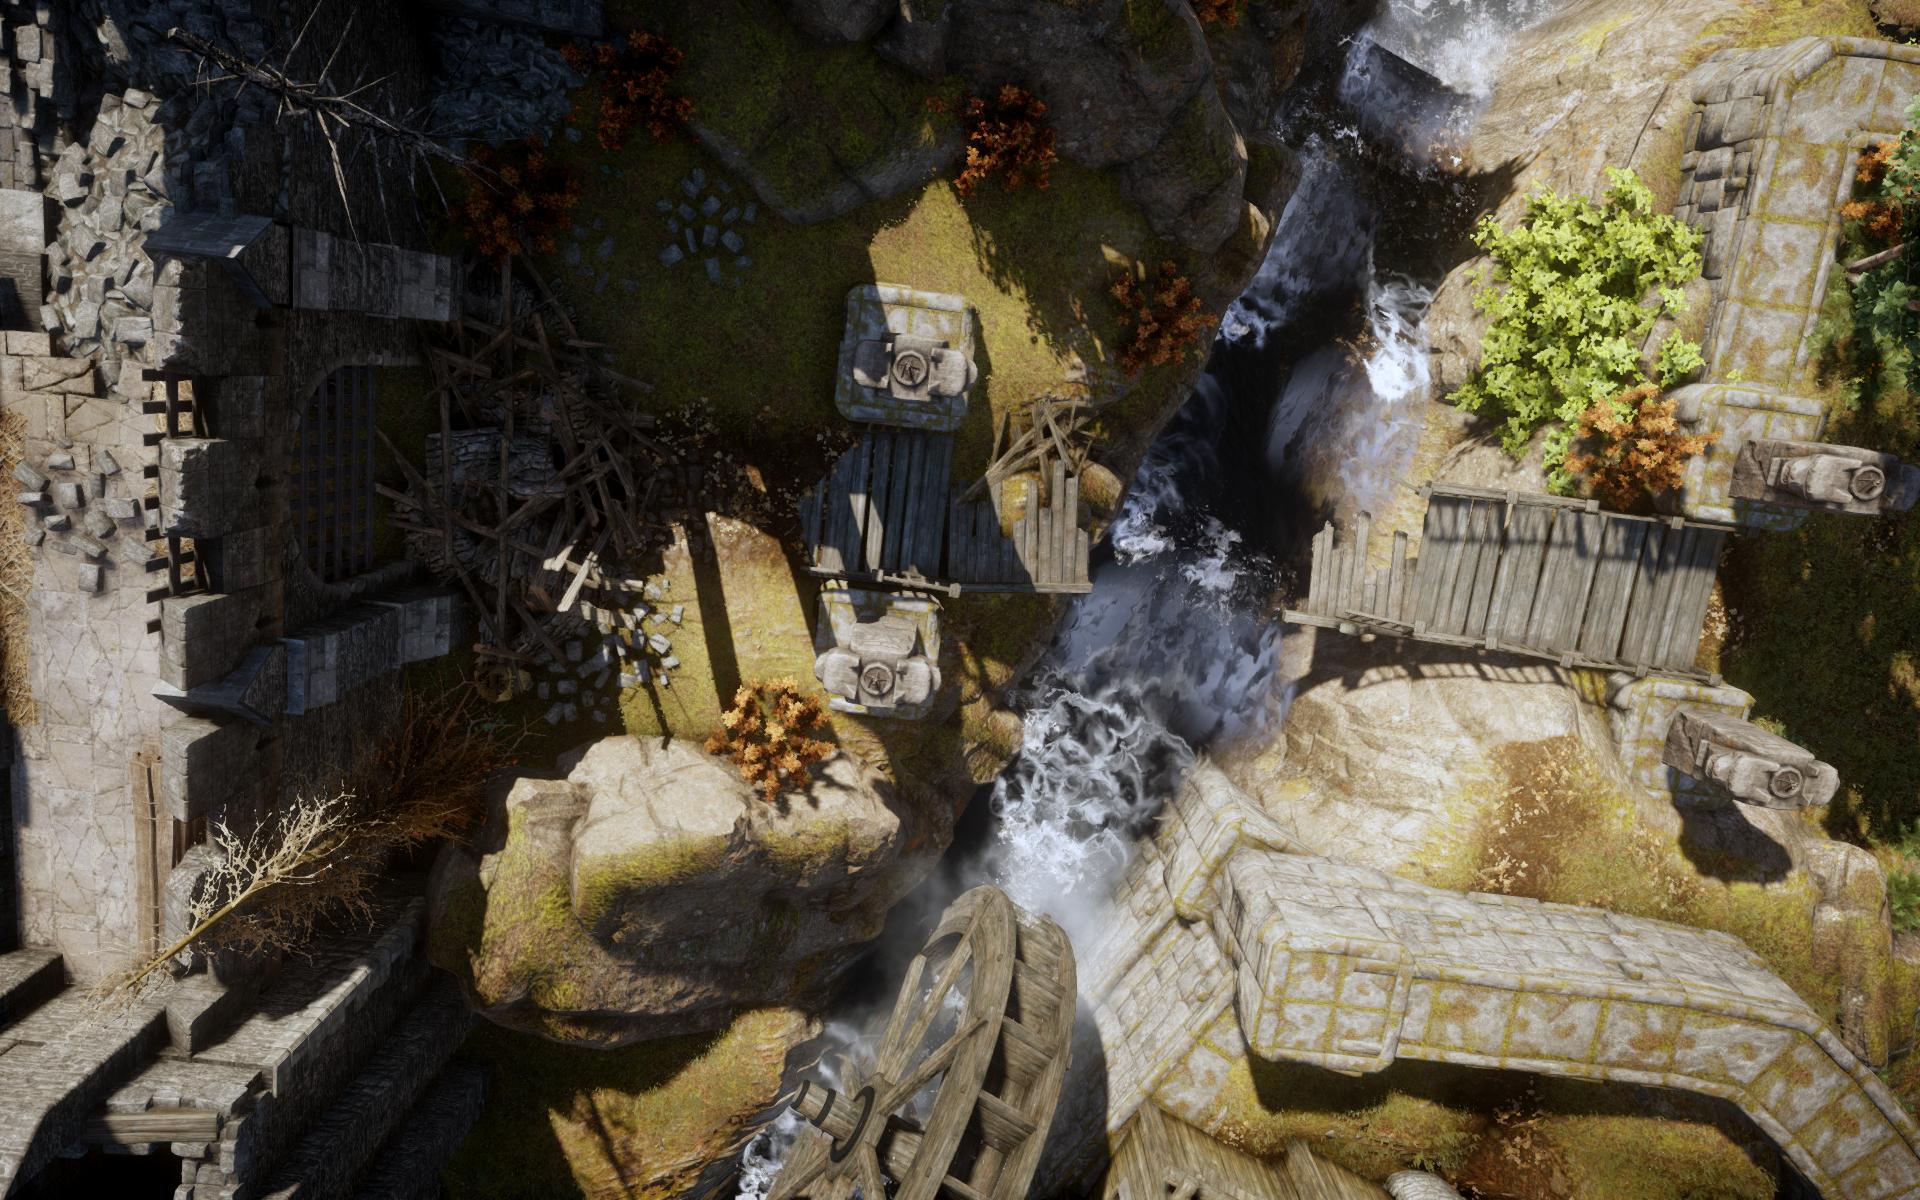 Dragon Age Inquisition Mapa.Dragon Age Inquisition Maps Set Album On Imgur In 2019